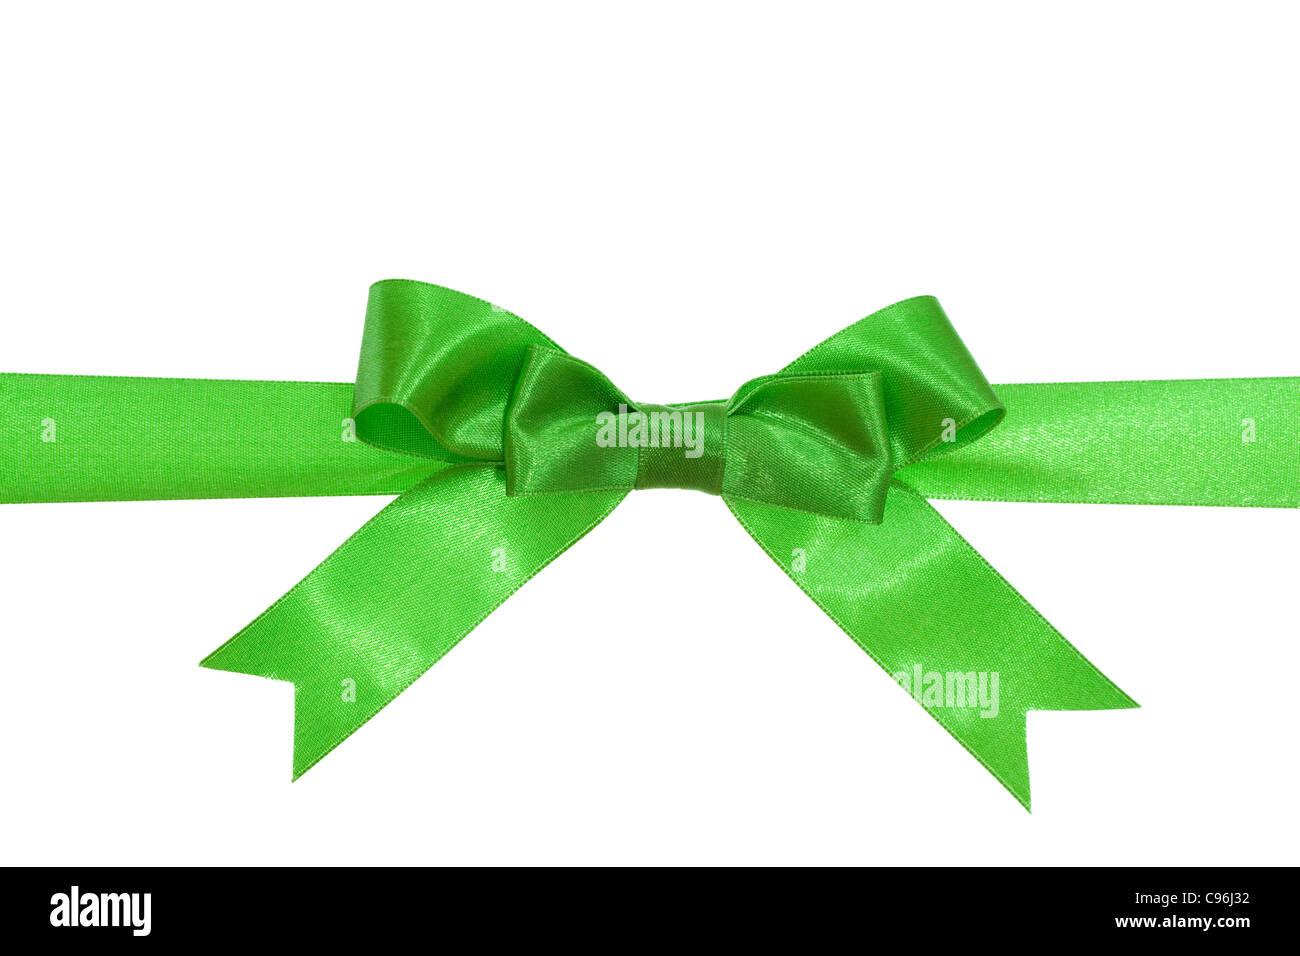 Ruban vert avec green bow on gift Photo Stock